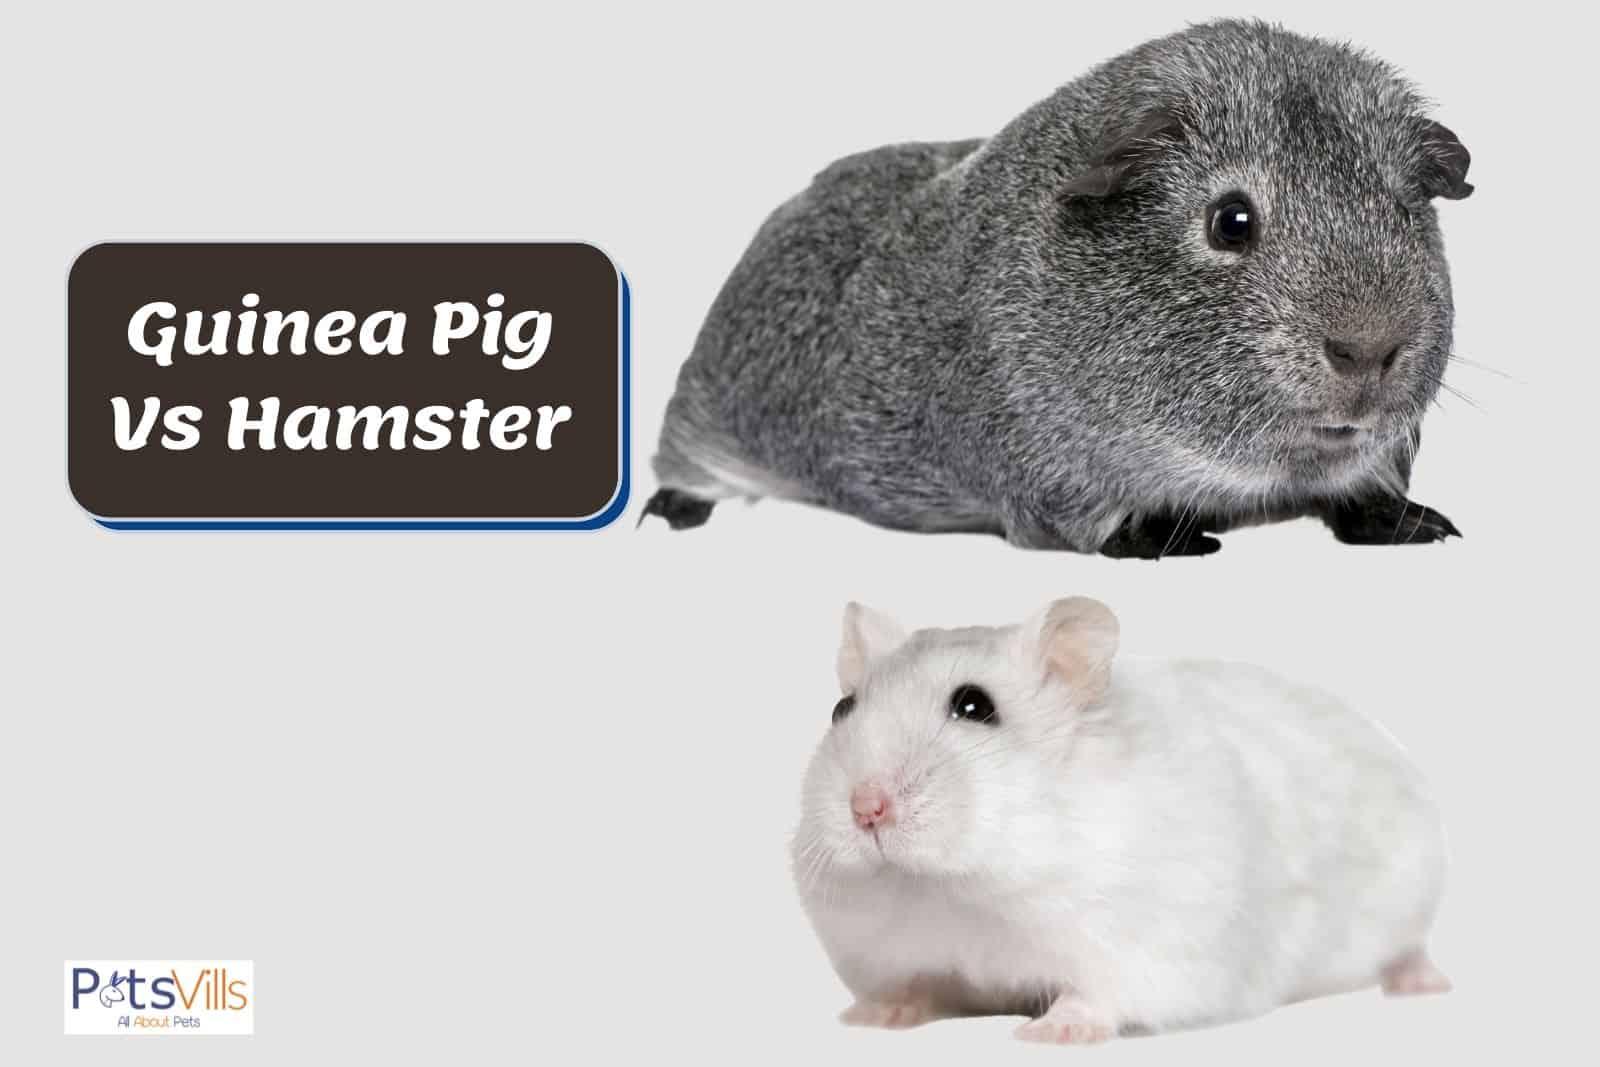 cavy and hamster together: guinea pig vs hamster